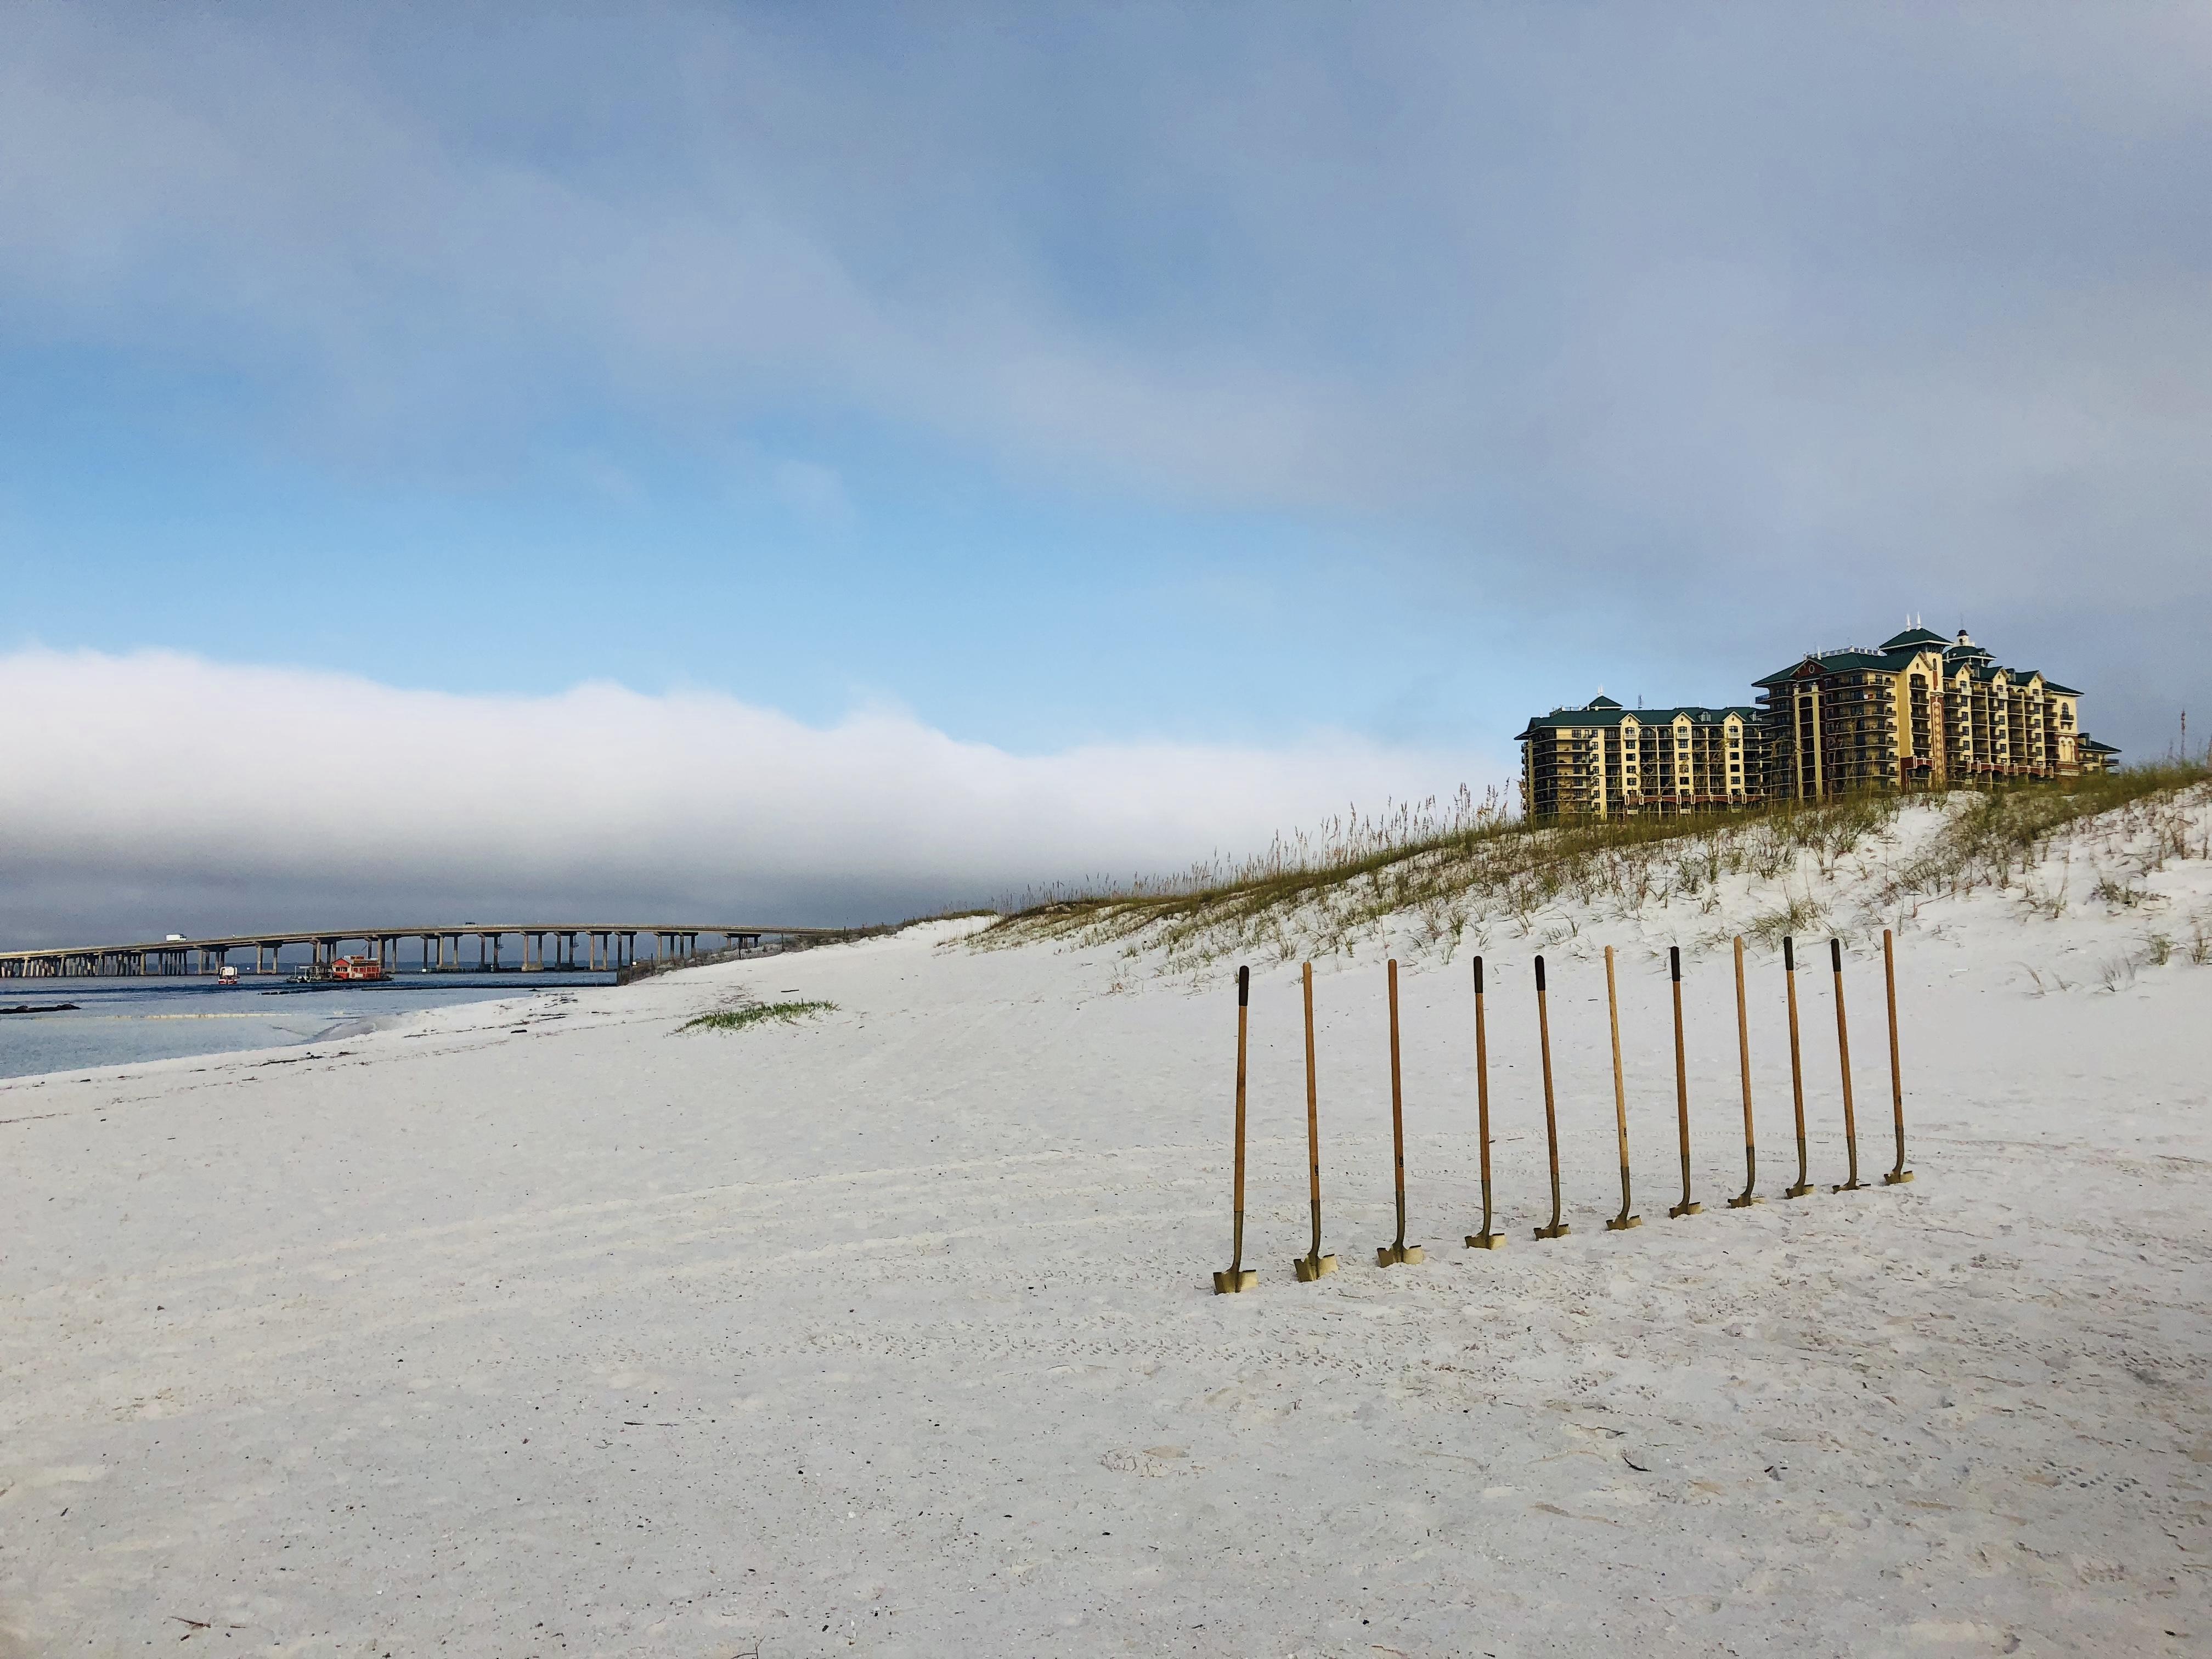 shovels on a beach